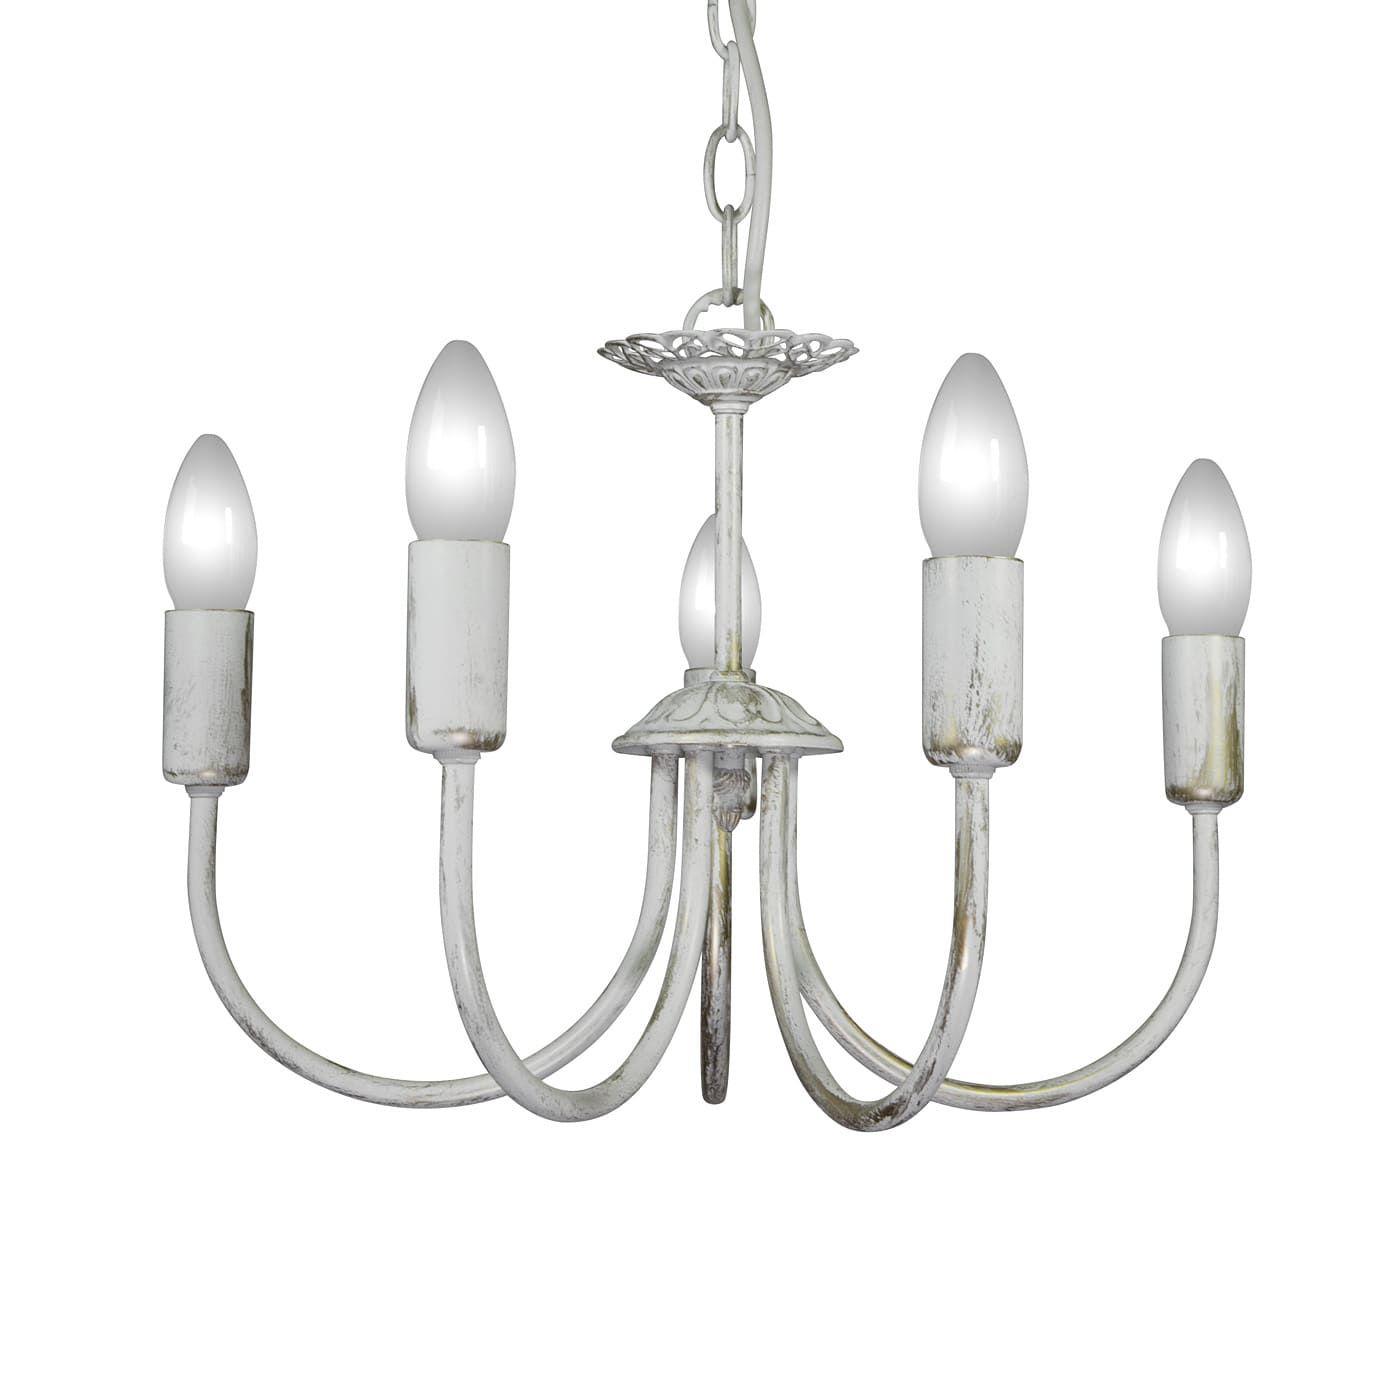 PETRASVET / Pendant chandelier S1169-5, 5xE14 max. 60W